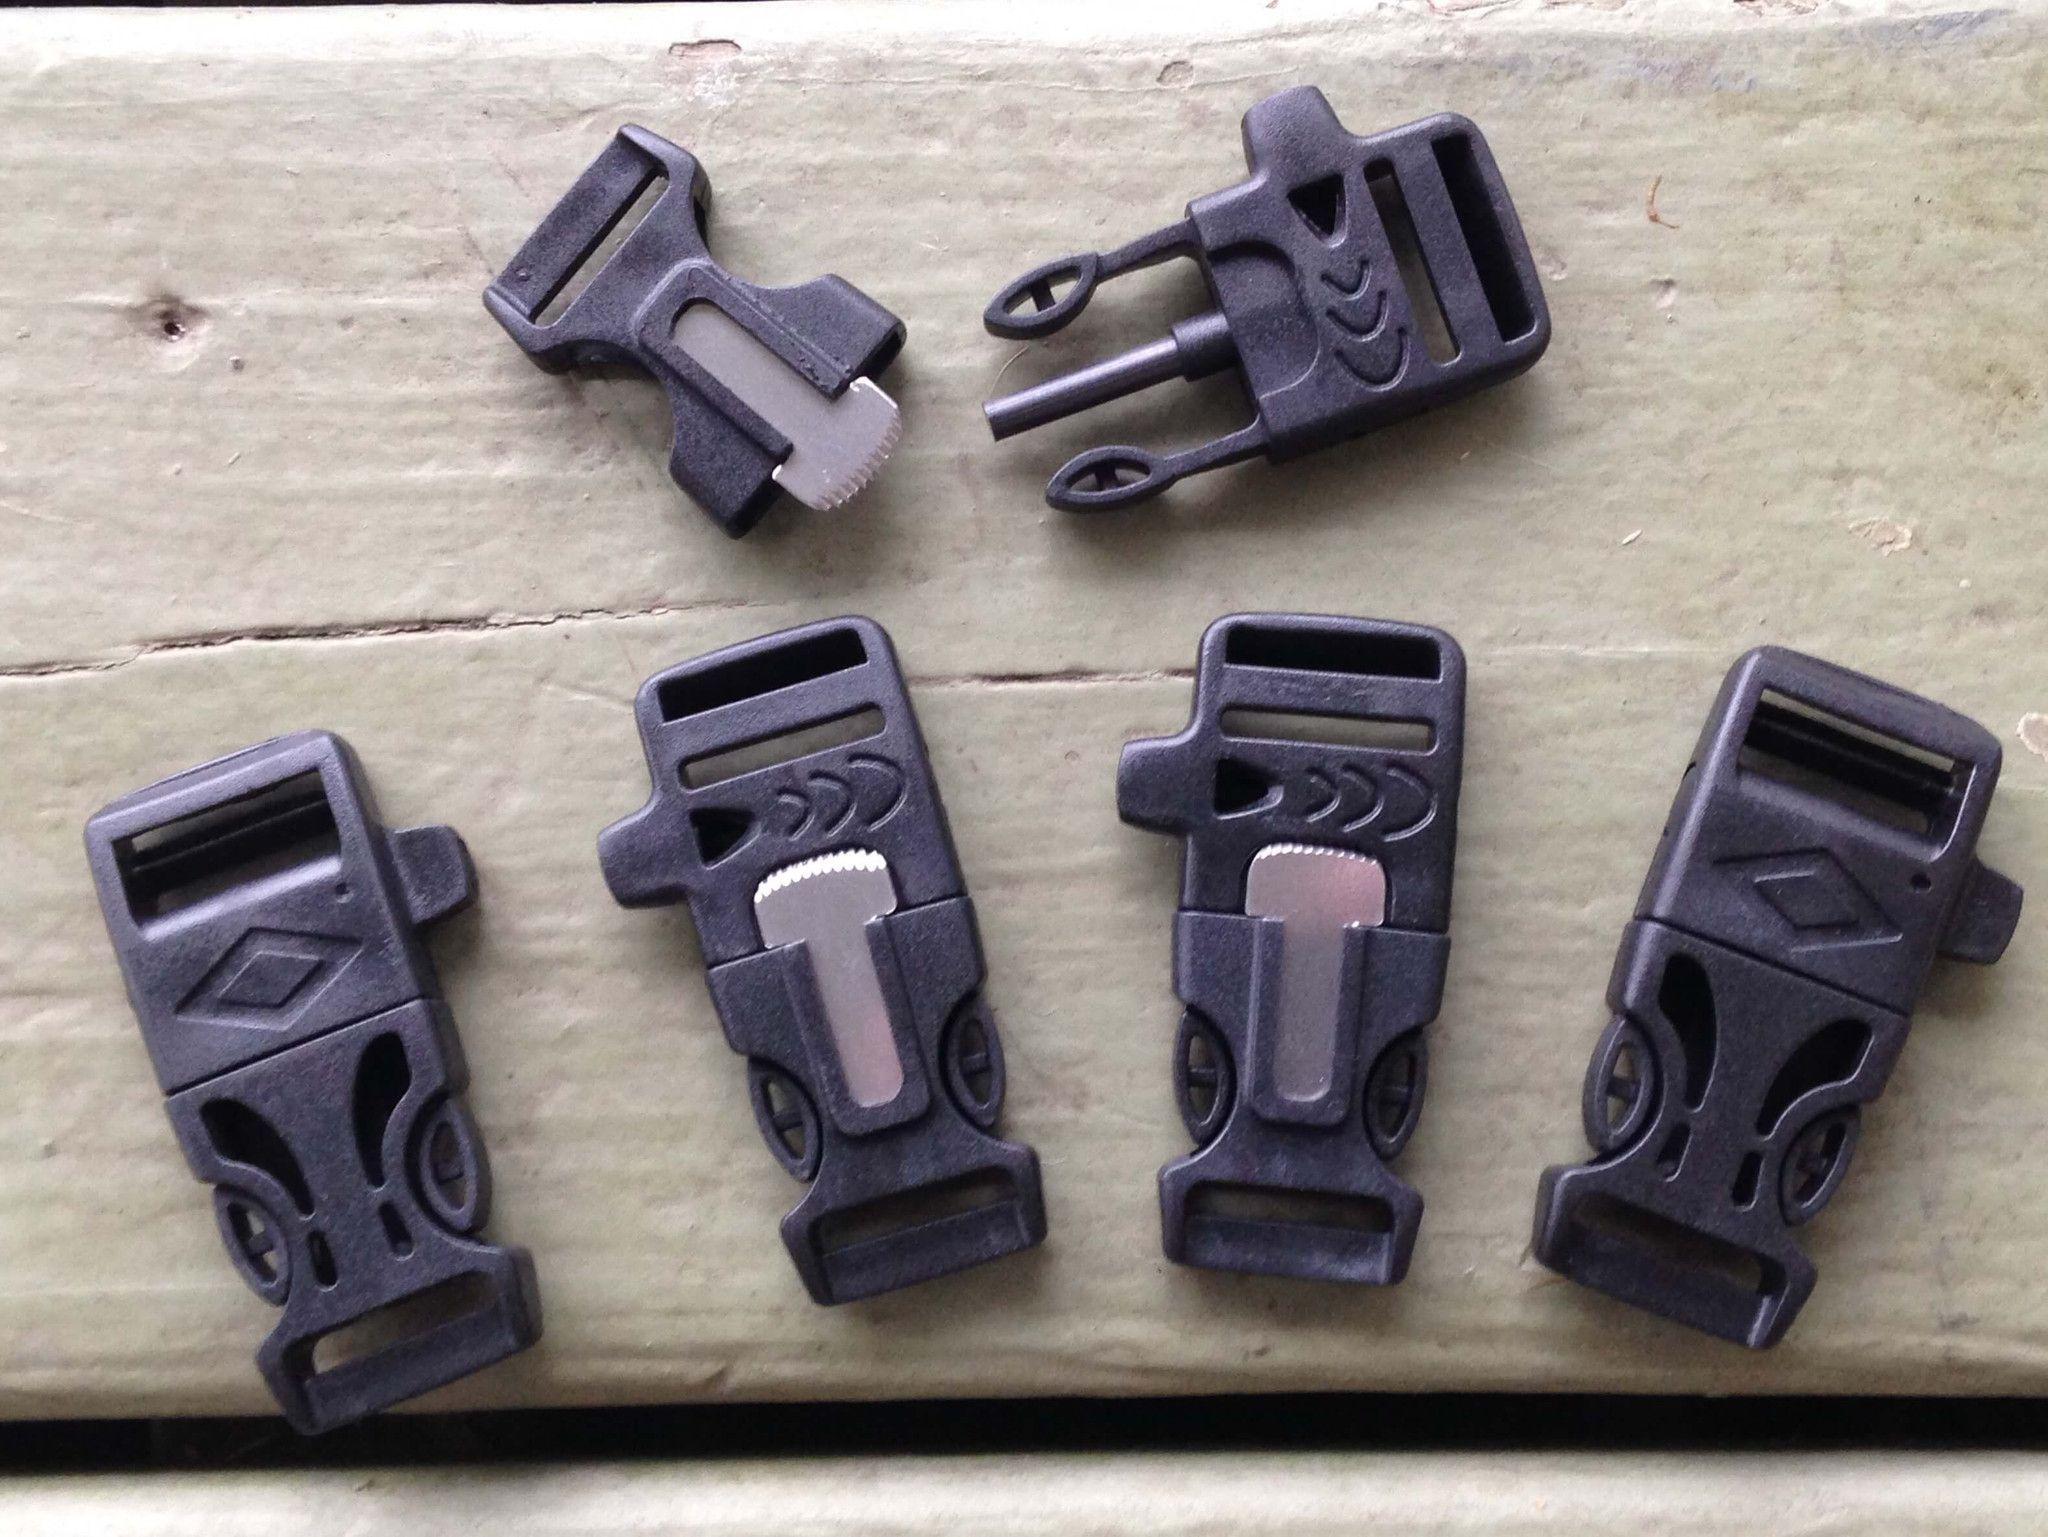 3 4 Flint Firesteel Whistle Paracord Buckles For Bracelets 1 Stockstill Outdoor Supply